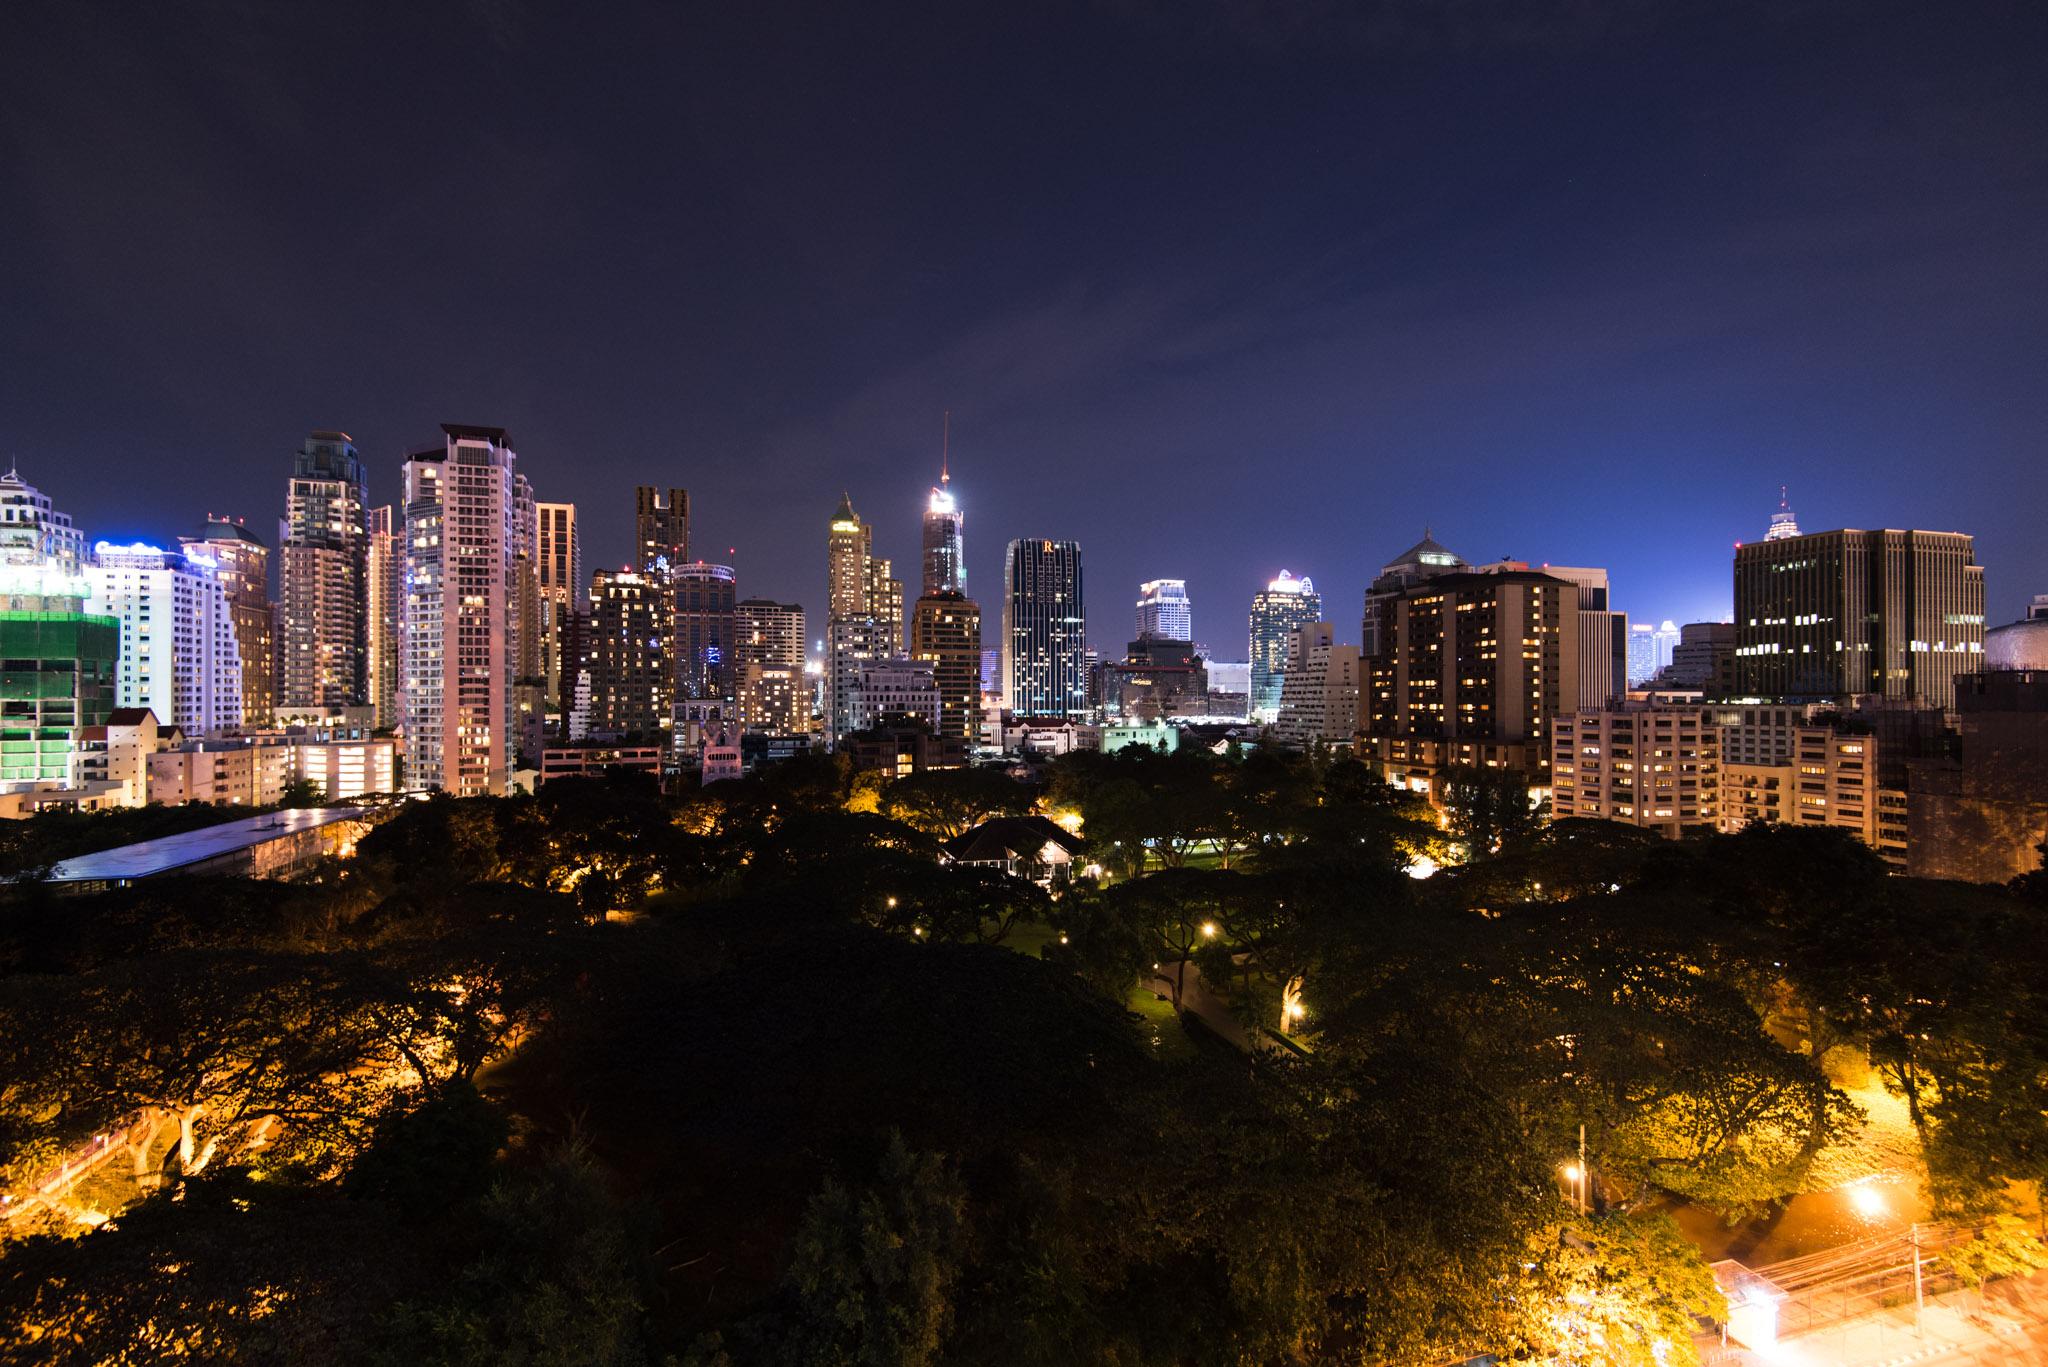 Night View from the Chaiyapruek Executive Room - Hotel Indigo Bangkok Wireless Road